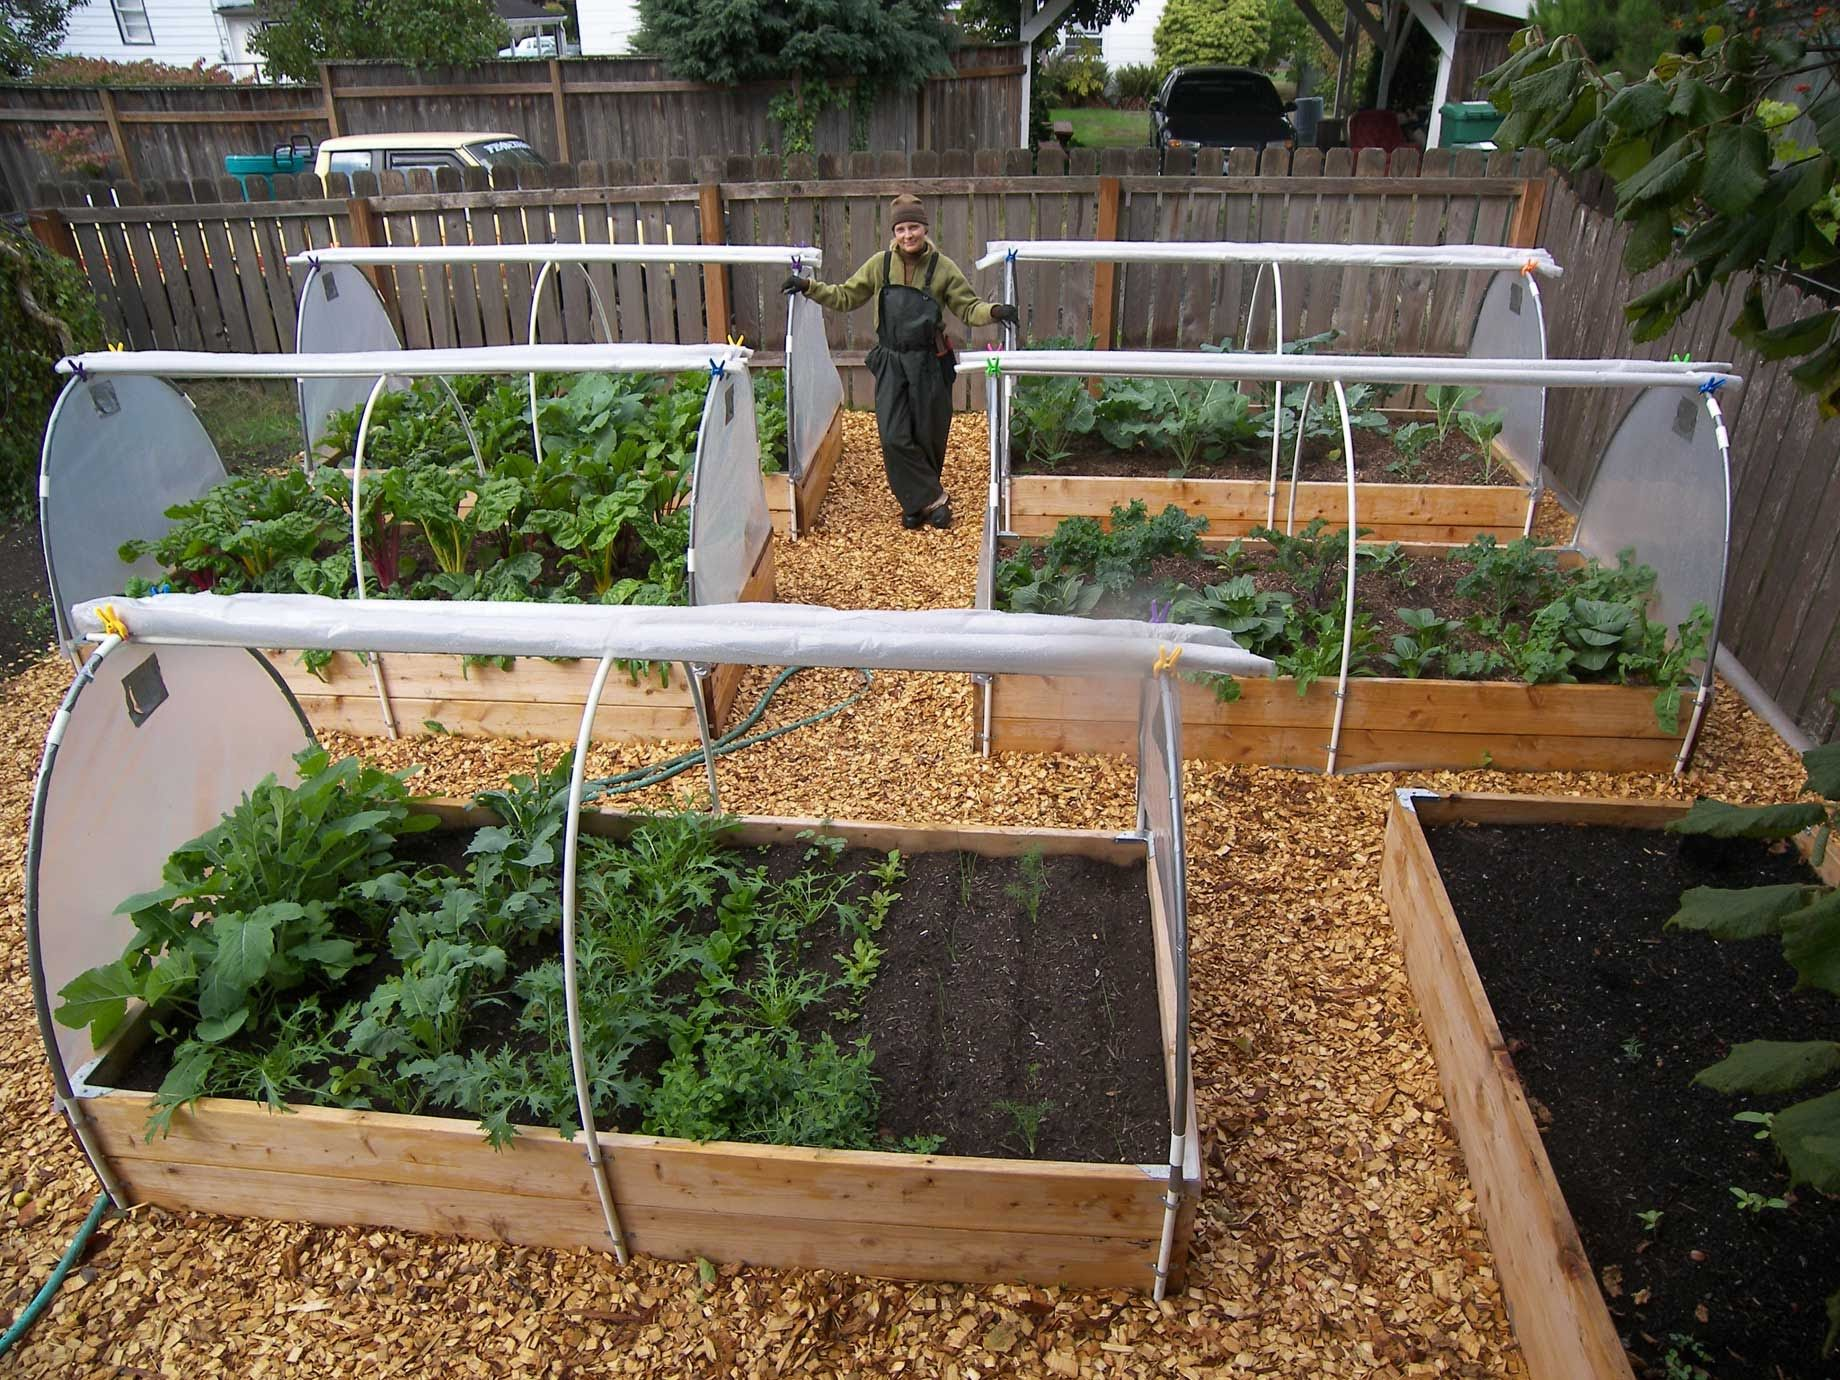 Vegetable Garden Ideas To Inspire You On How To Decorate Your Garden  1013642 | Spelonca.